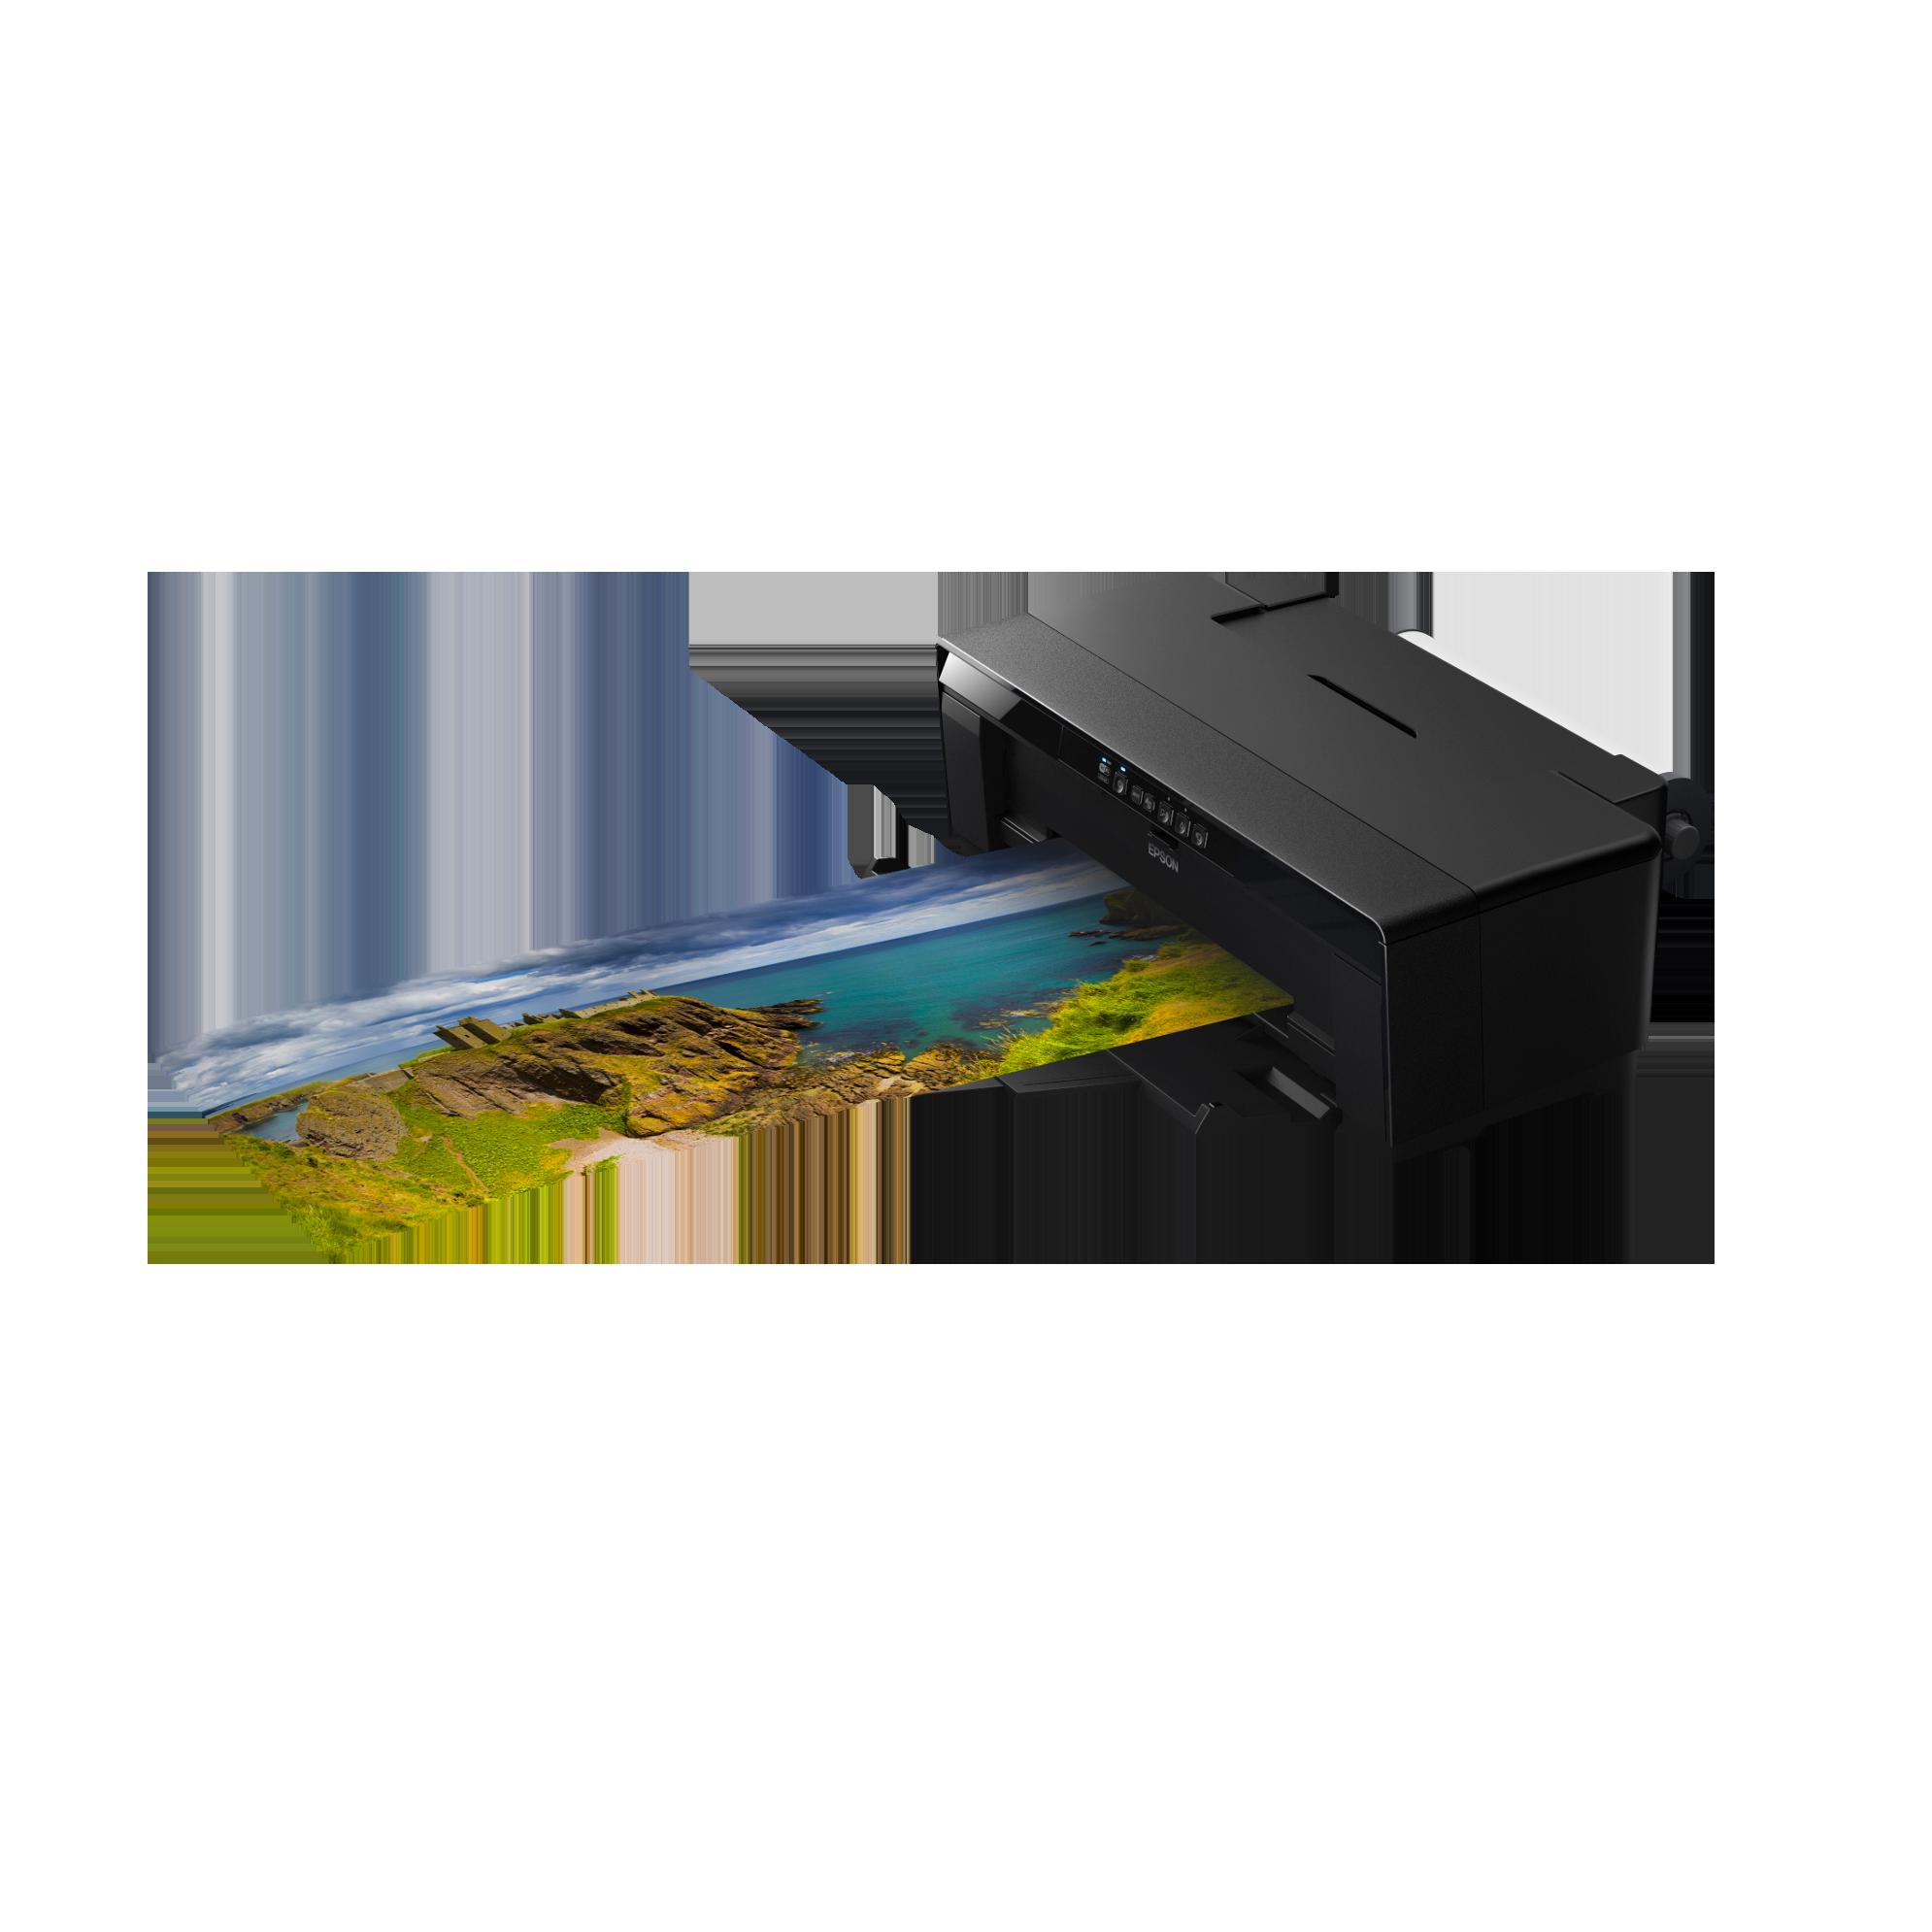 Epson UK announces SC-P400, the smallest and lightest A3+